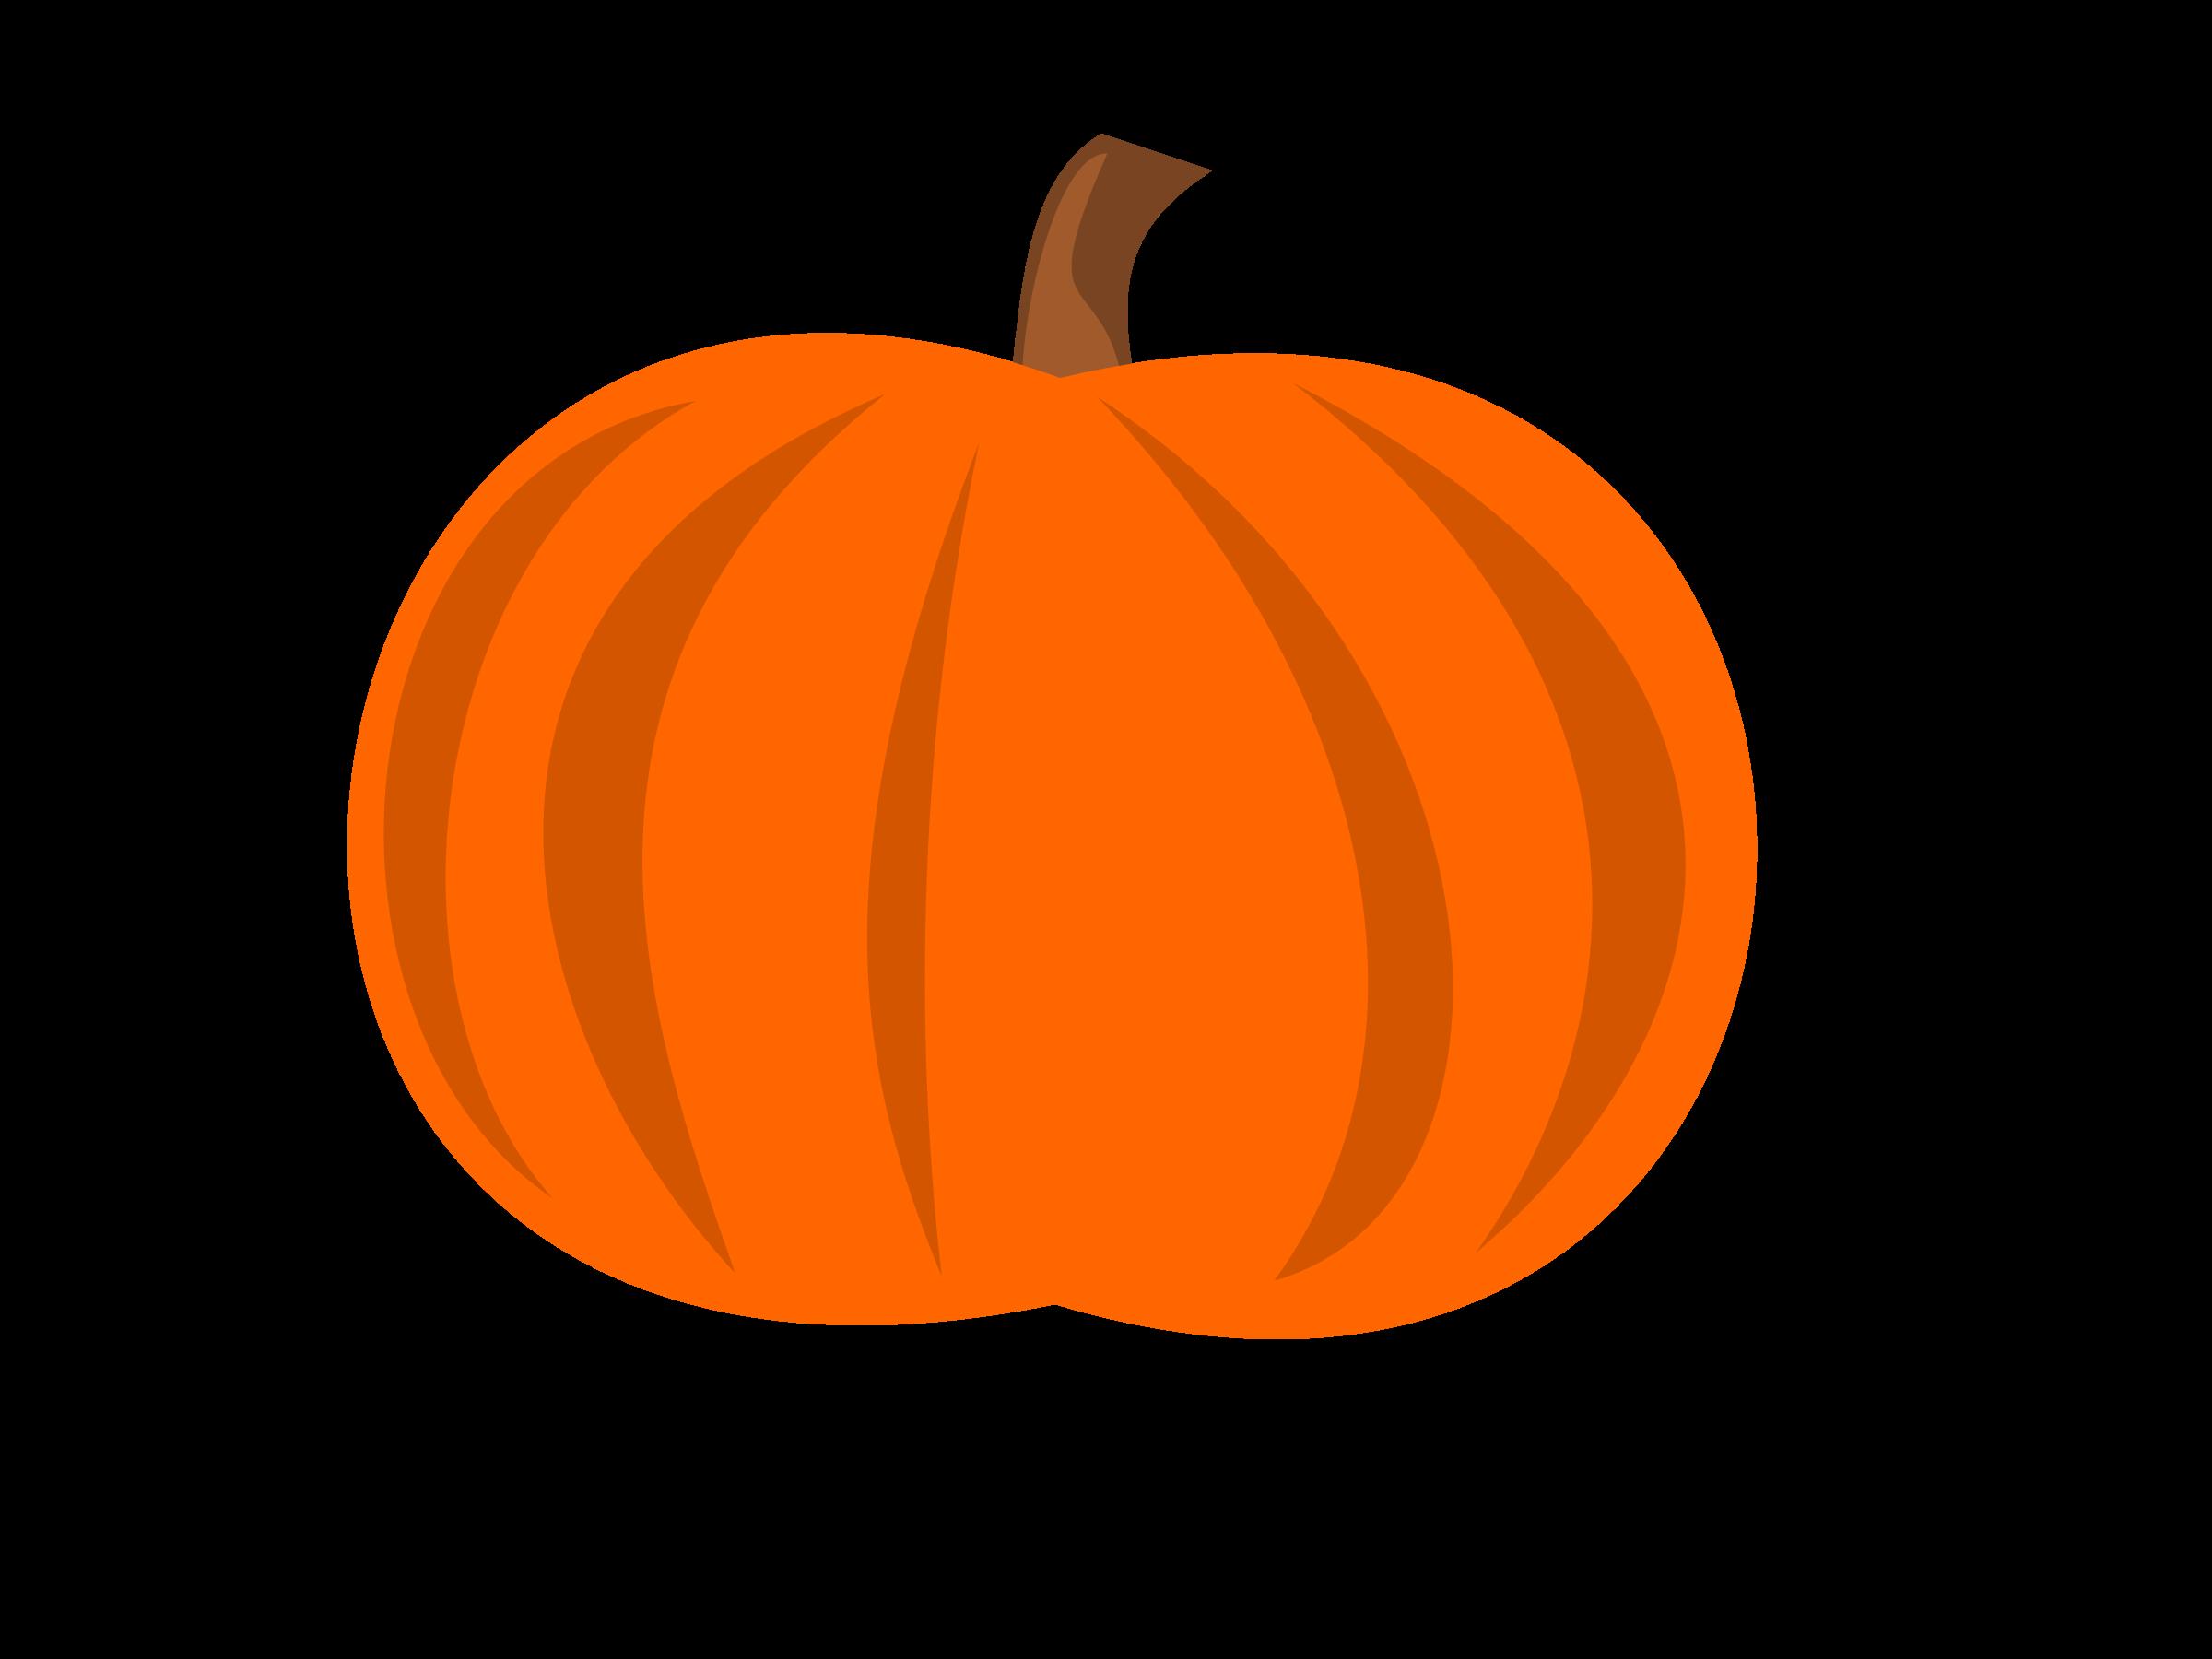 2400x1800 Pumpkin Cartoon Clip Art Fun For Christmas